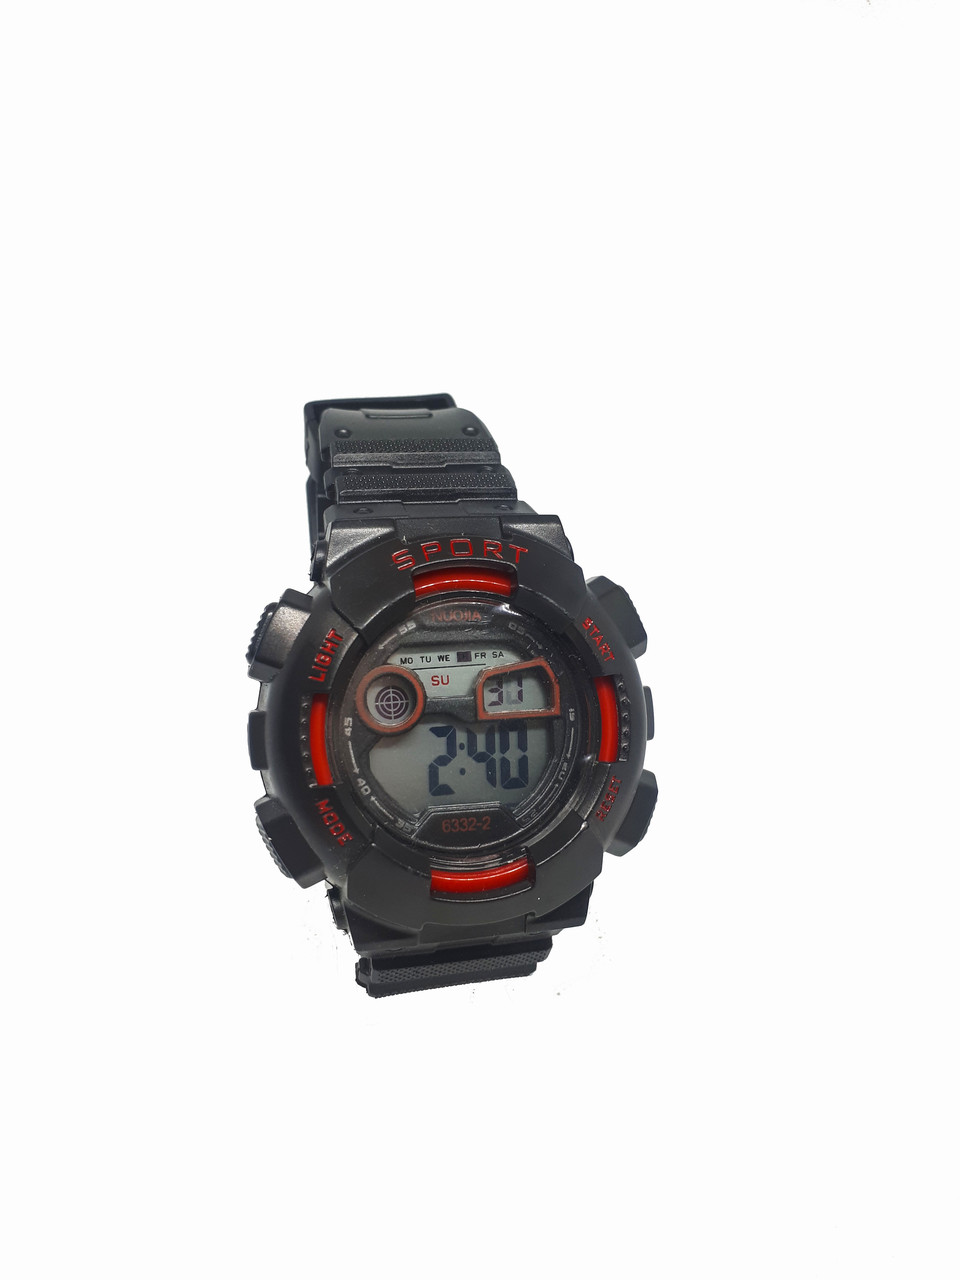 Часы Nuojia электронные водонепроницаемые. Красный